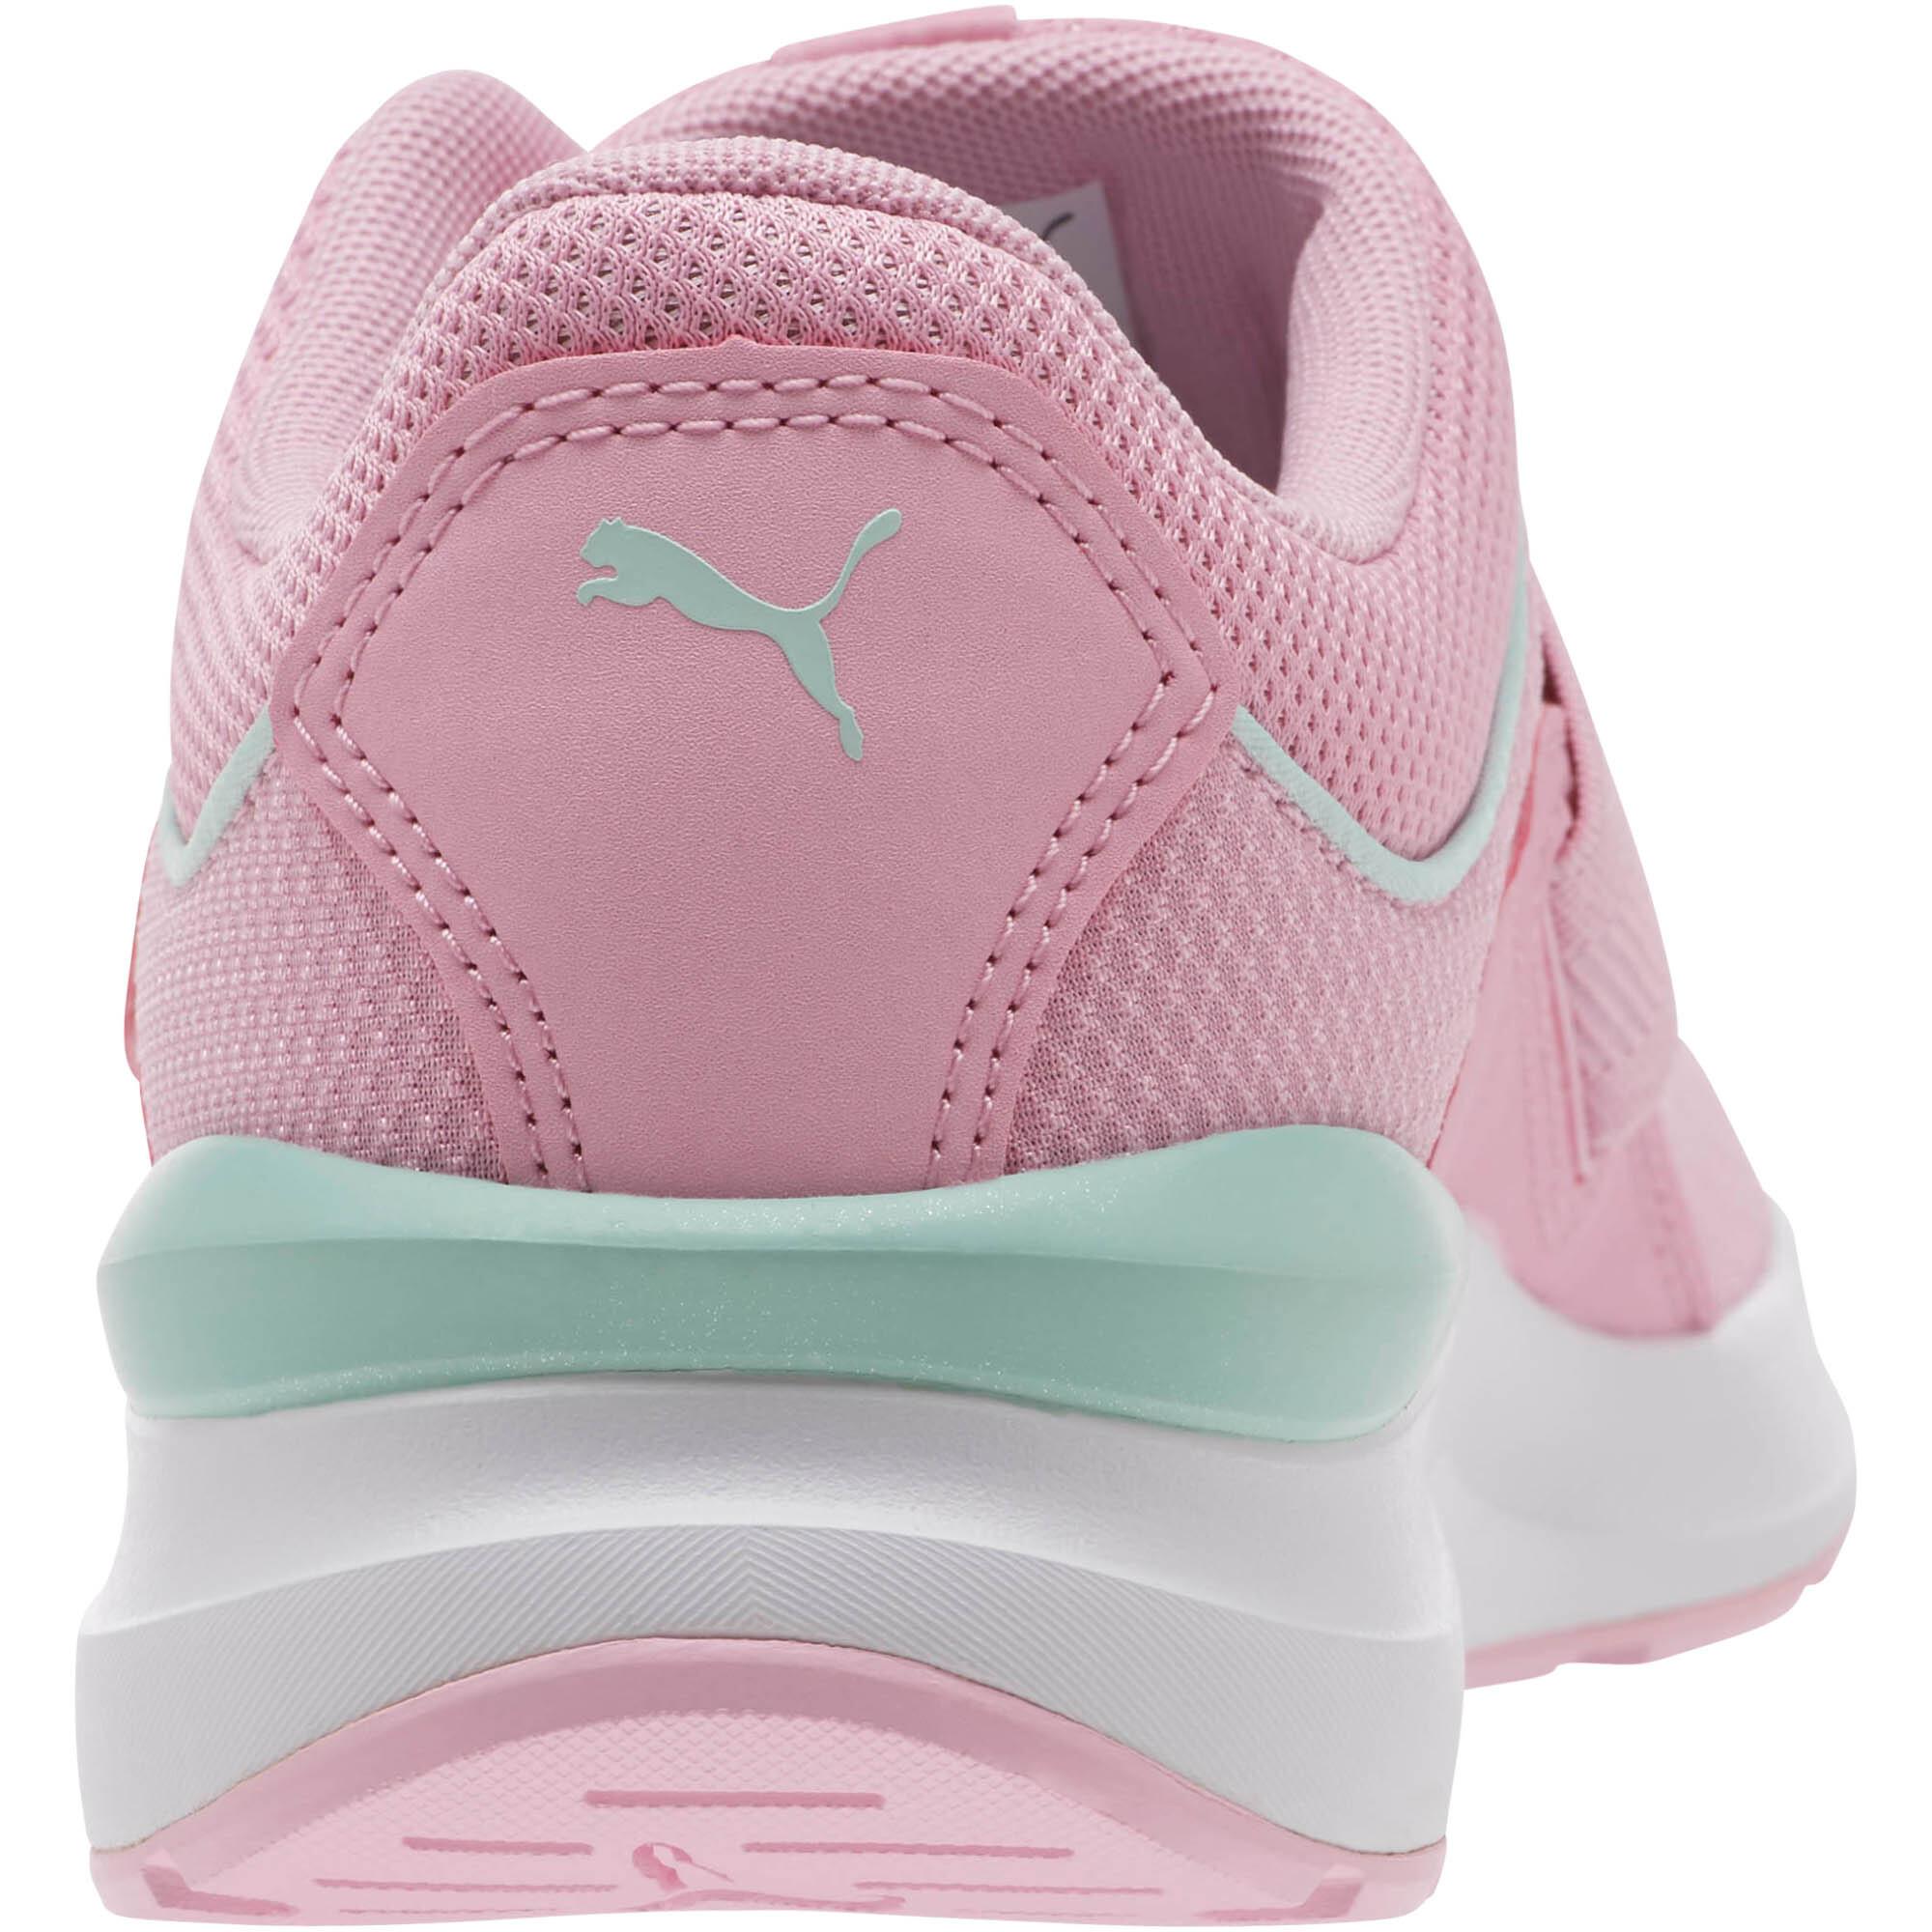 PUMA-Adela-X-Women-s-Sneakers-Women-Shoe-Basics thumbnail 3